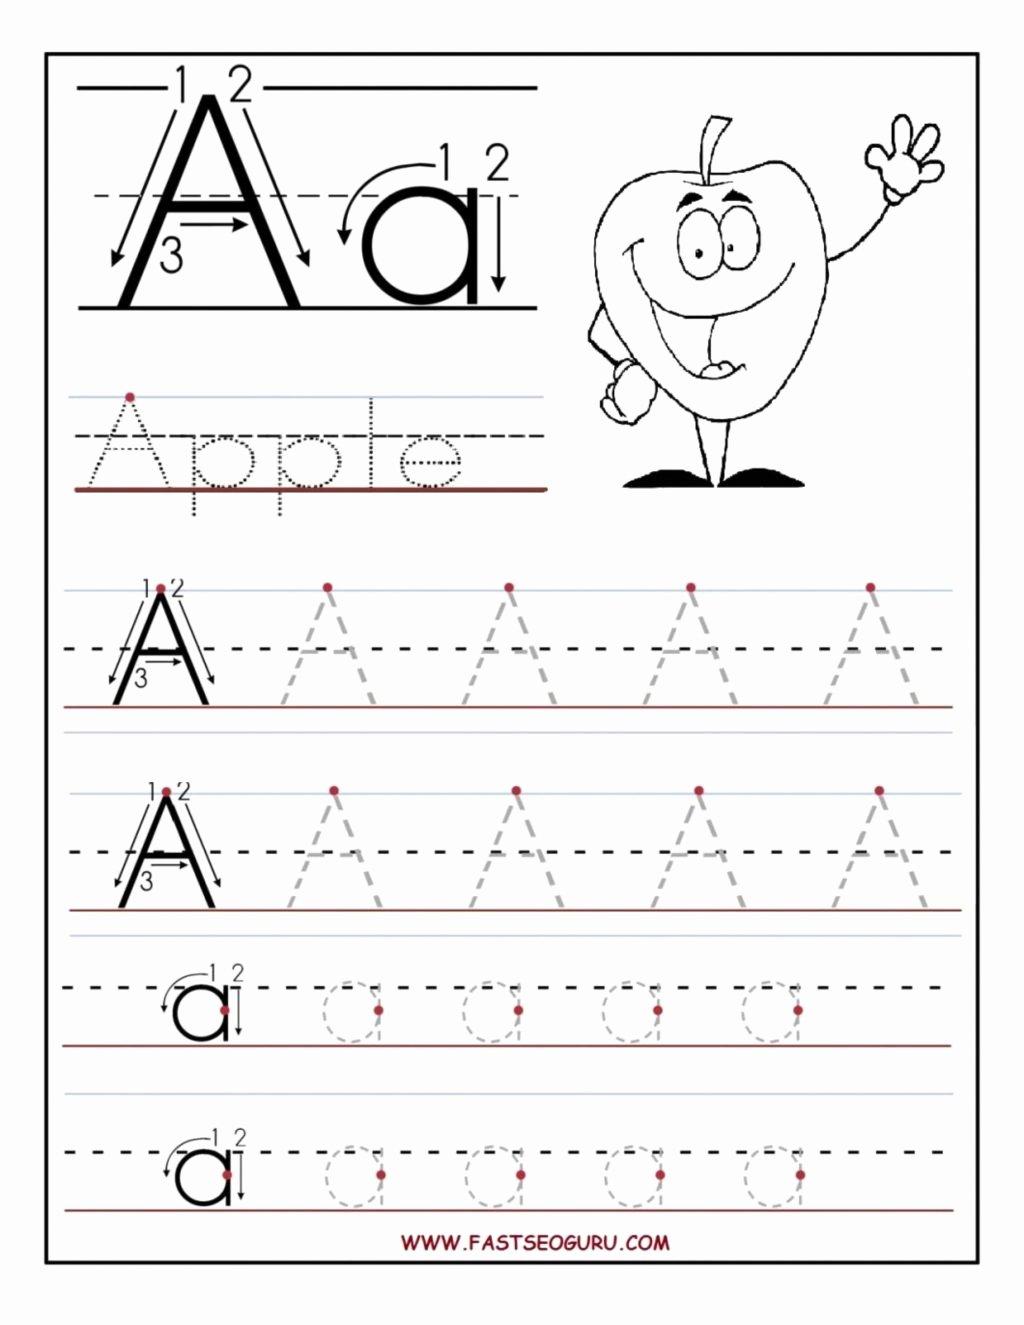 Transport Worksheets for Preschoolers top Worksheet Letters Tracing Templates Barka Free Preschool